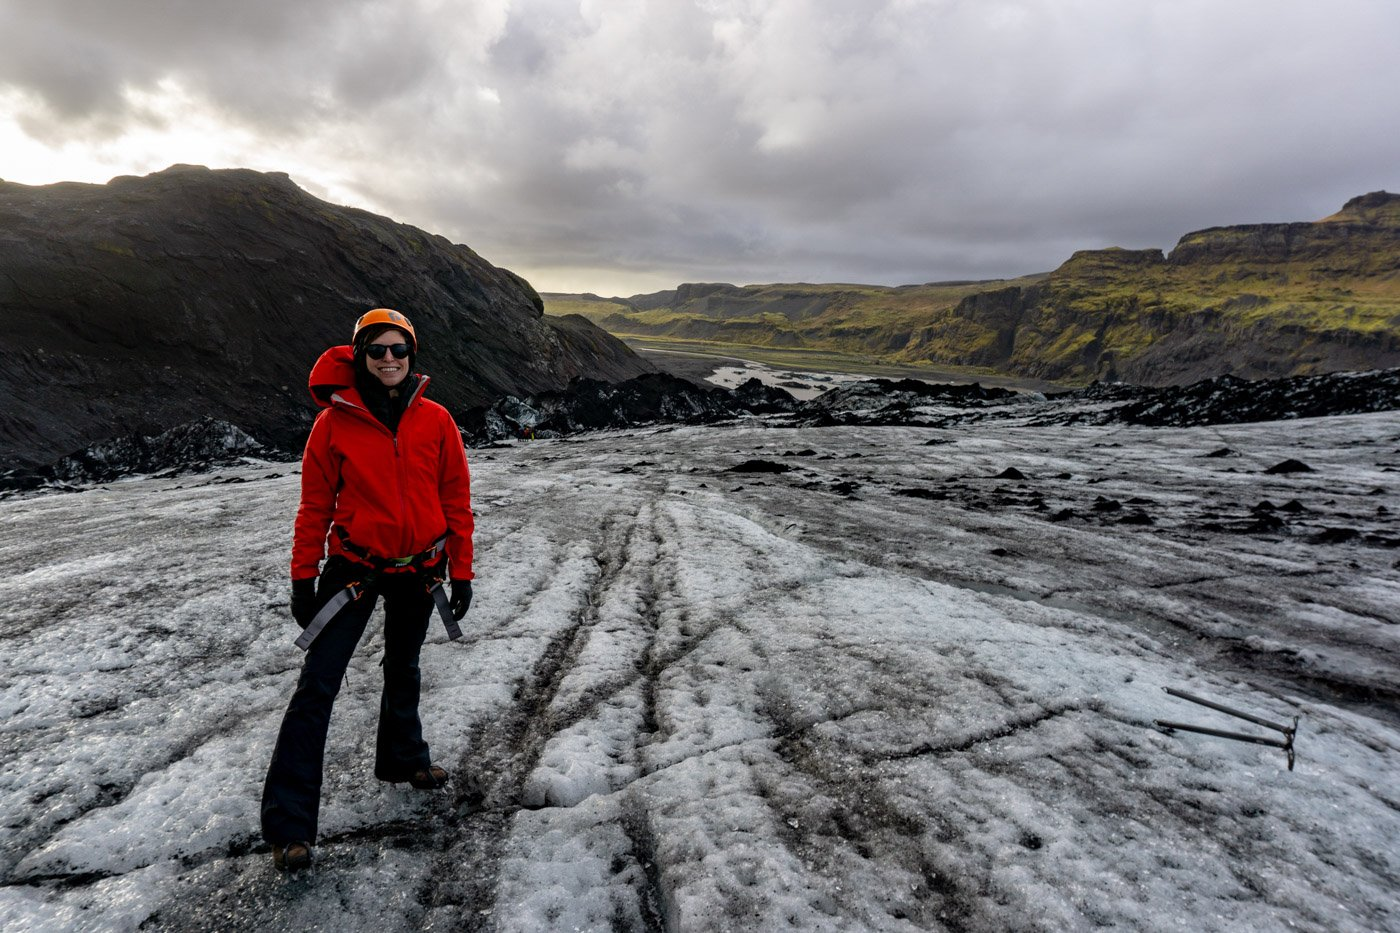 Blue Mountain Belle doing a glacier hike on Solheimajokull Iceland